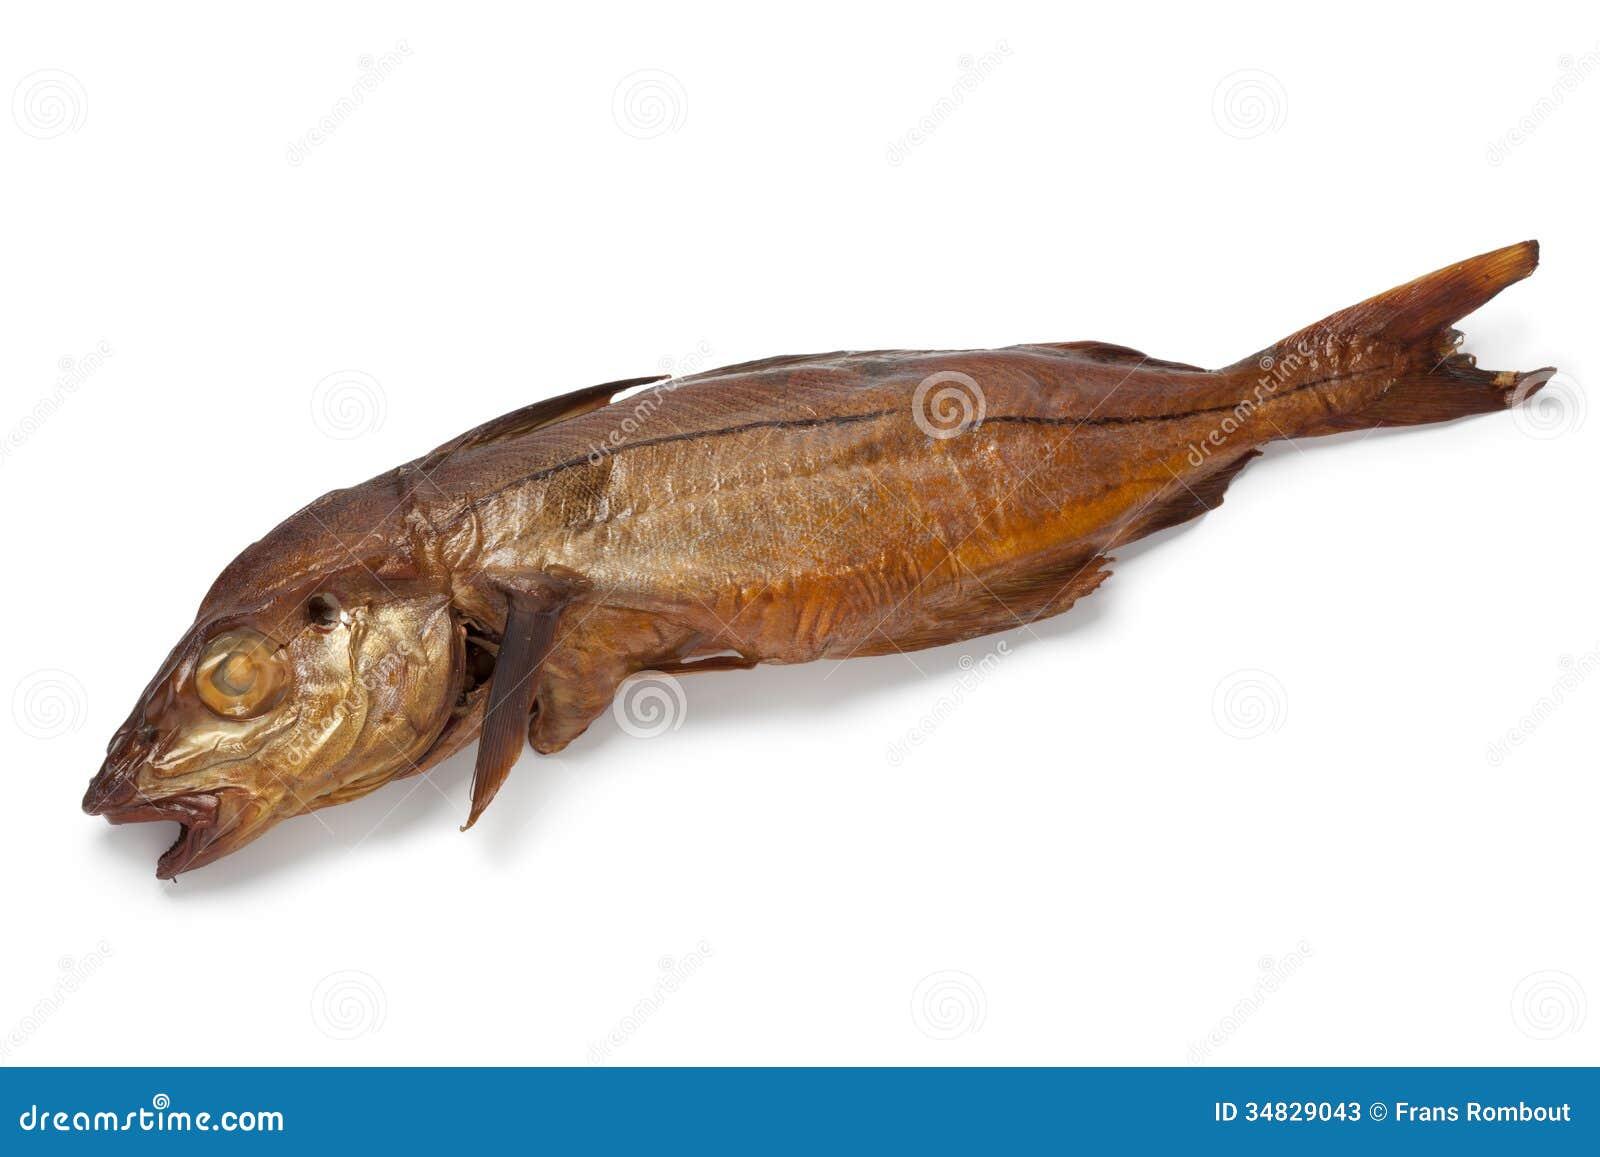 Smoked haddock fish stock photos image 34829043 for Where to fish